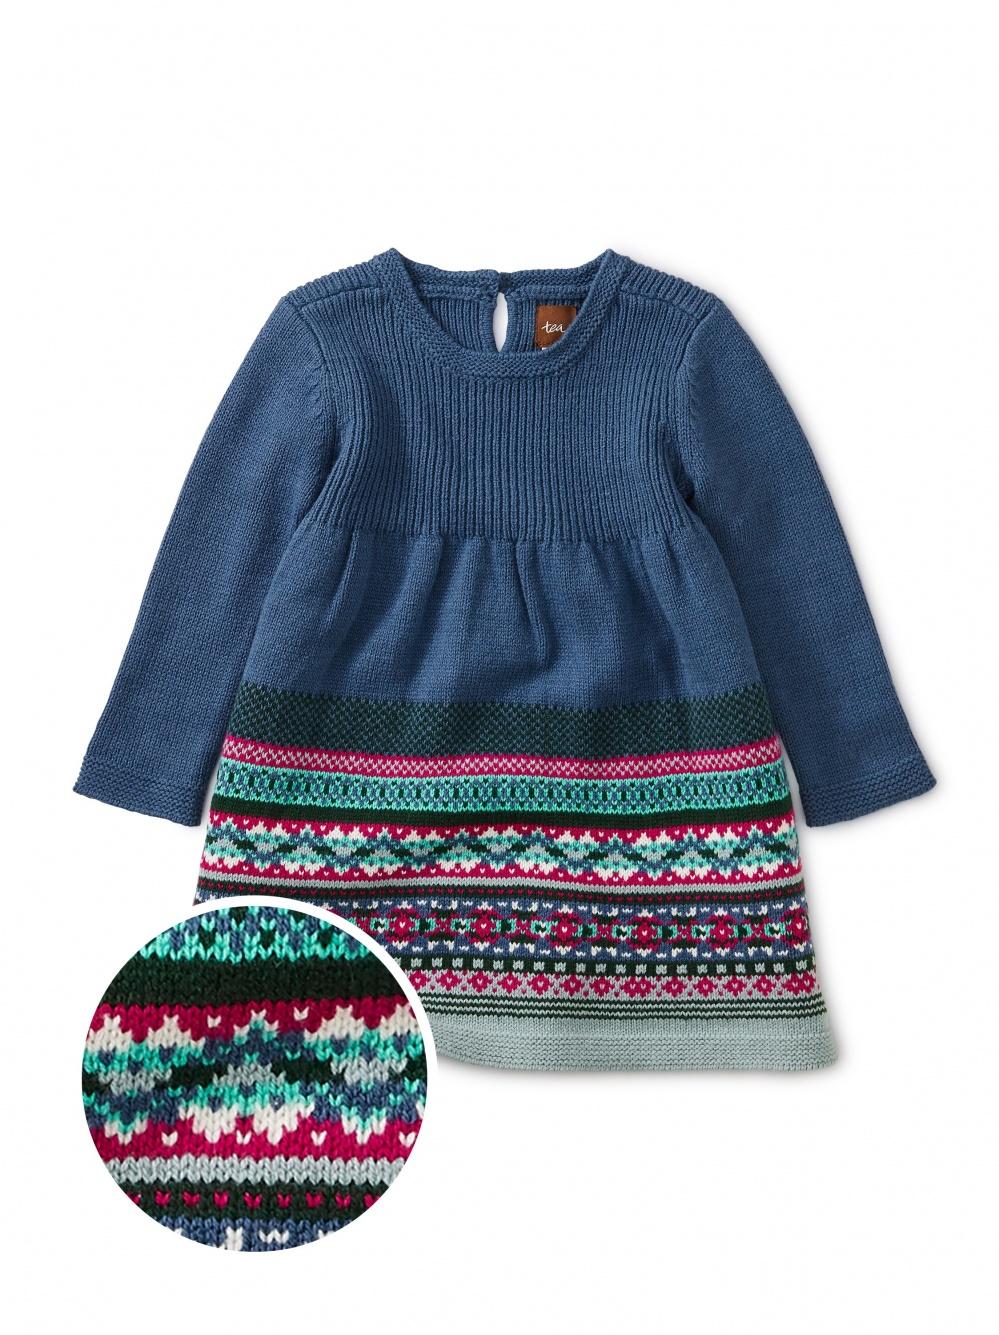 Fairisle Baby Sweater Dress